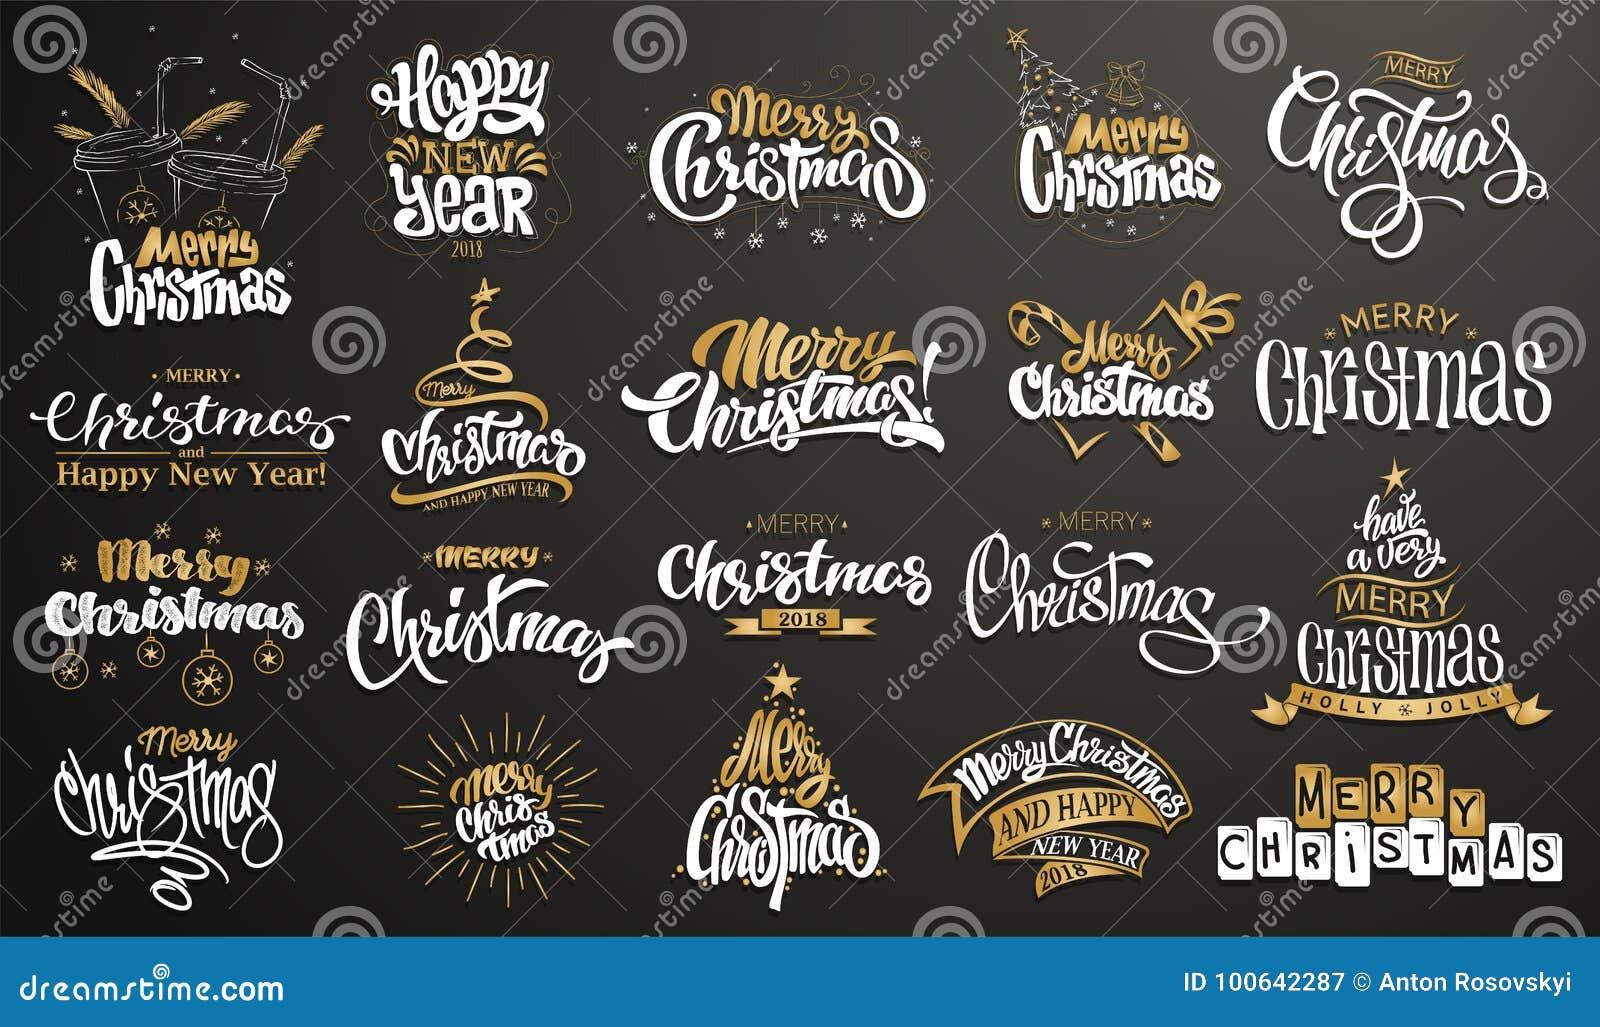 Merry Christmas. Happy New Year. Handwritten modern brush lettering, Typography set